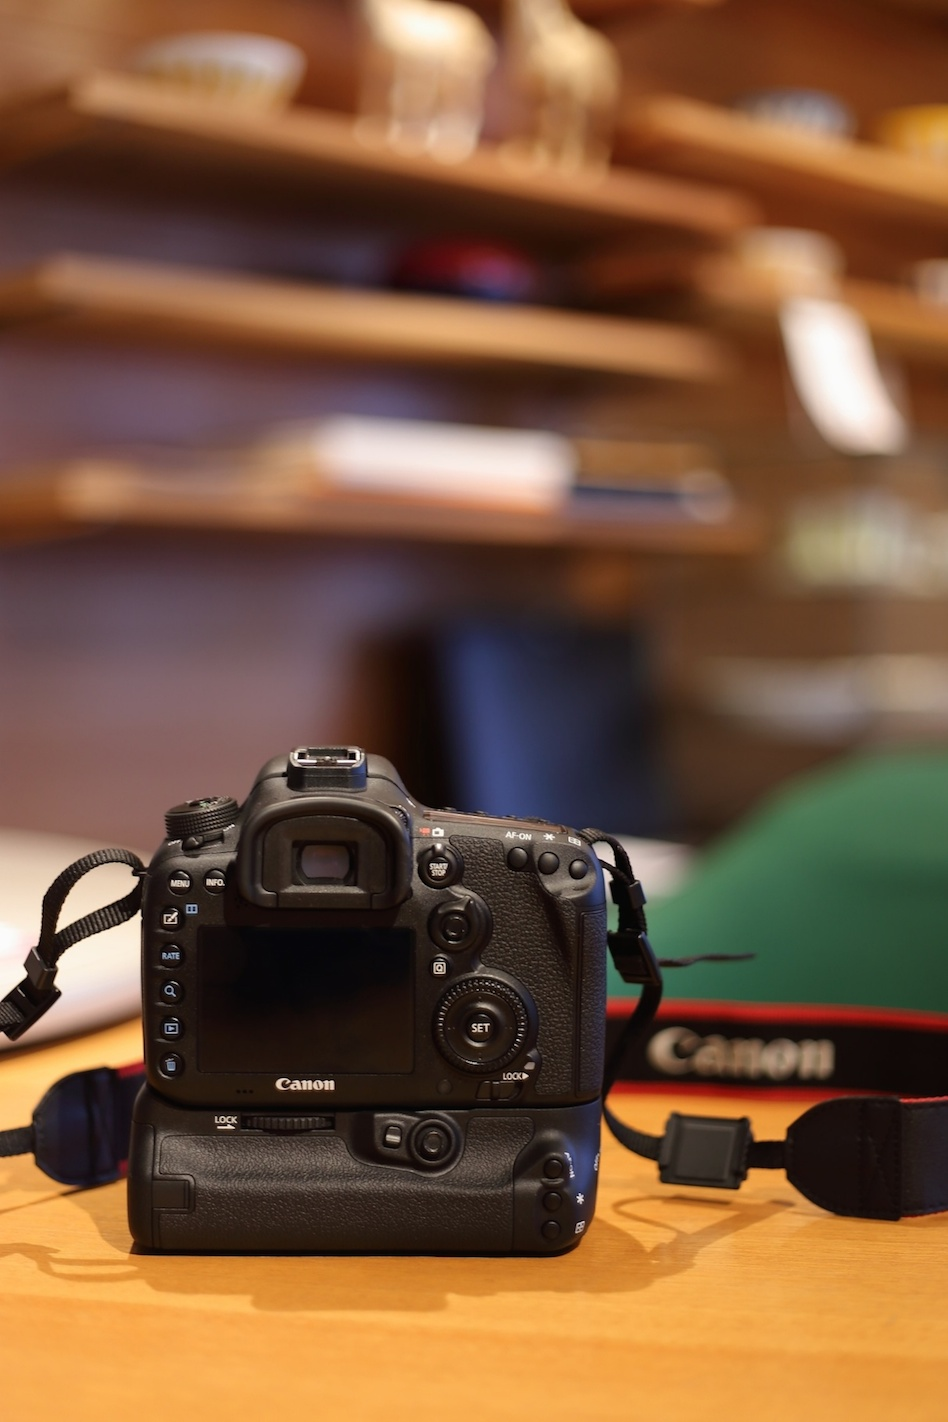 Canon EOS 7D Mark II GET BG(バッテリーグリップ)キャンペーン_d0081605_1433289.jpg